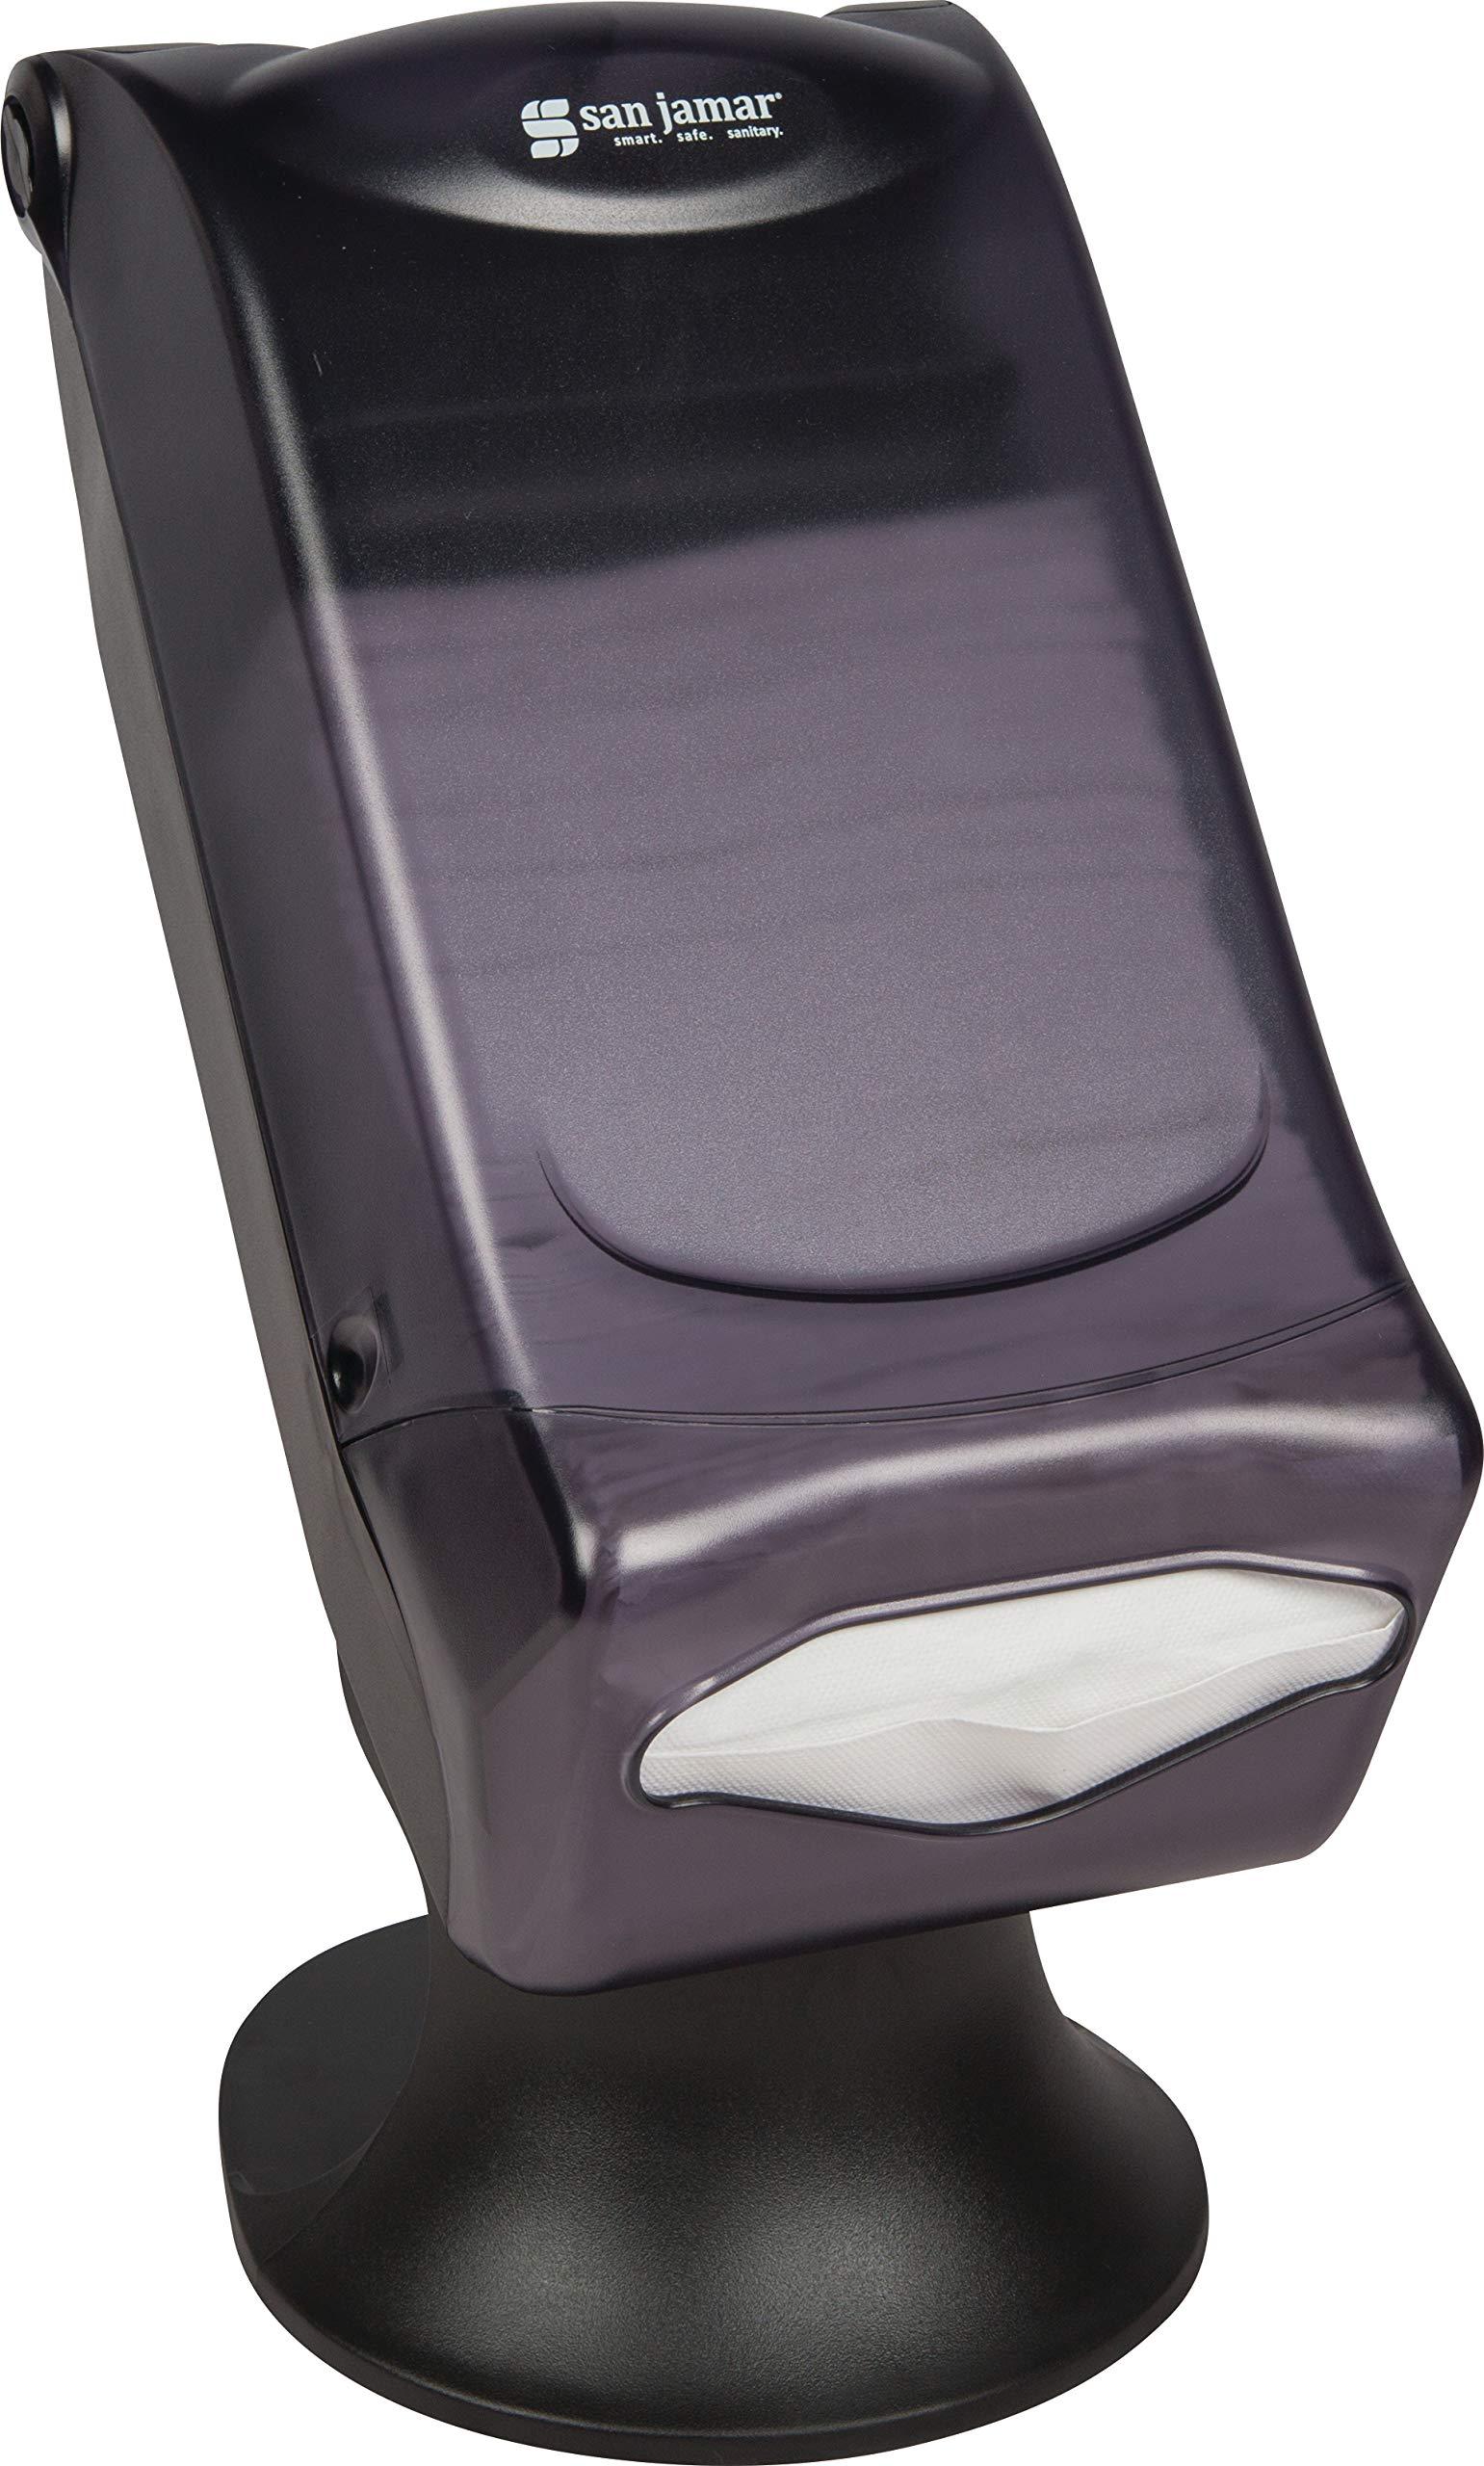 San Jamar H5005S Venue Fullfold Control Napkin Dispenser with Stand, 500 Capacity, 8'' Width x 17-1/2'' Height x 13'' Depth, Black Pearl by San Jamar (Image #6)